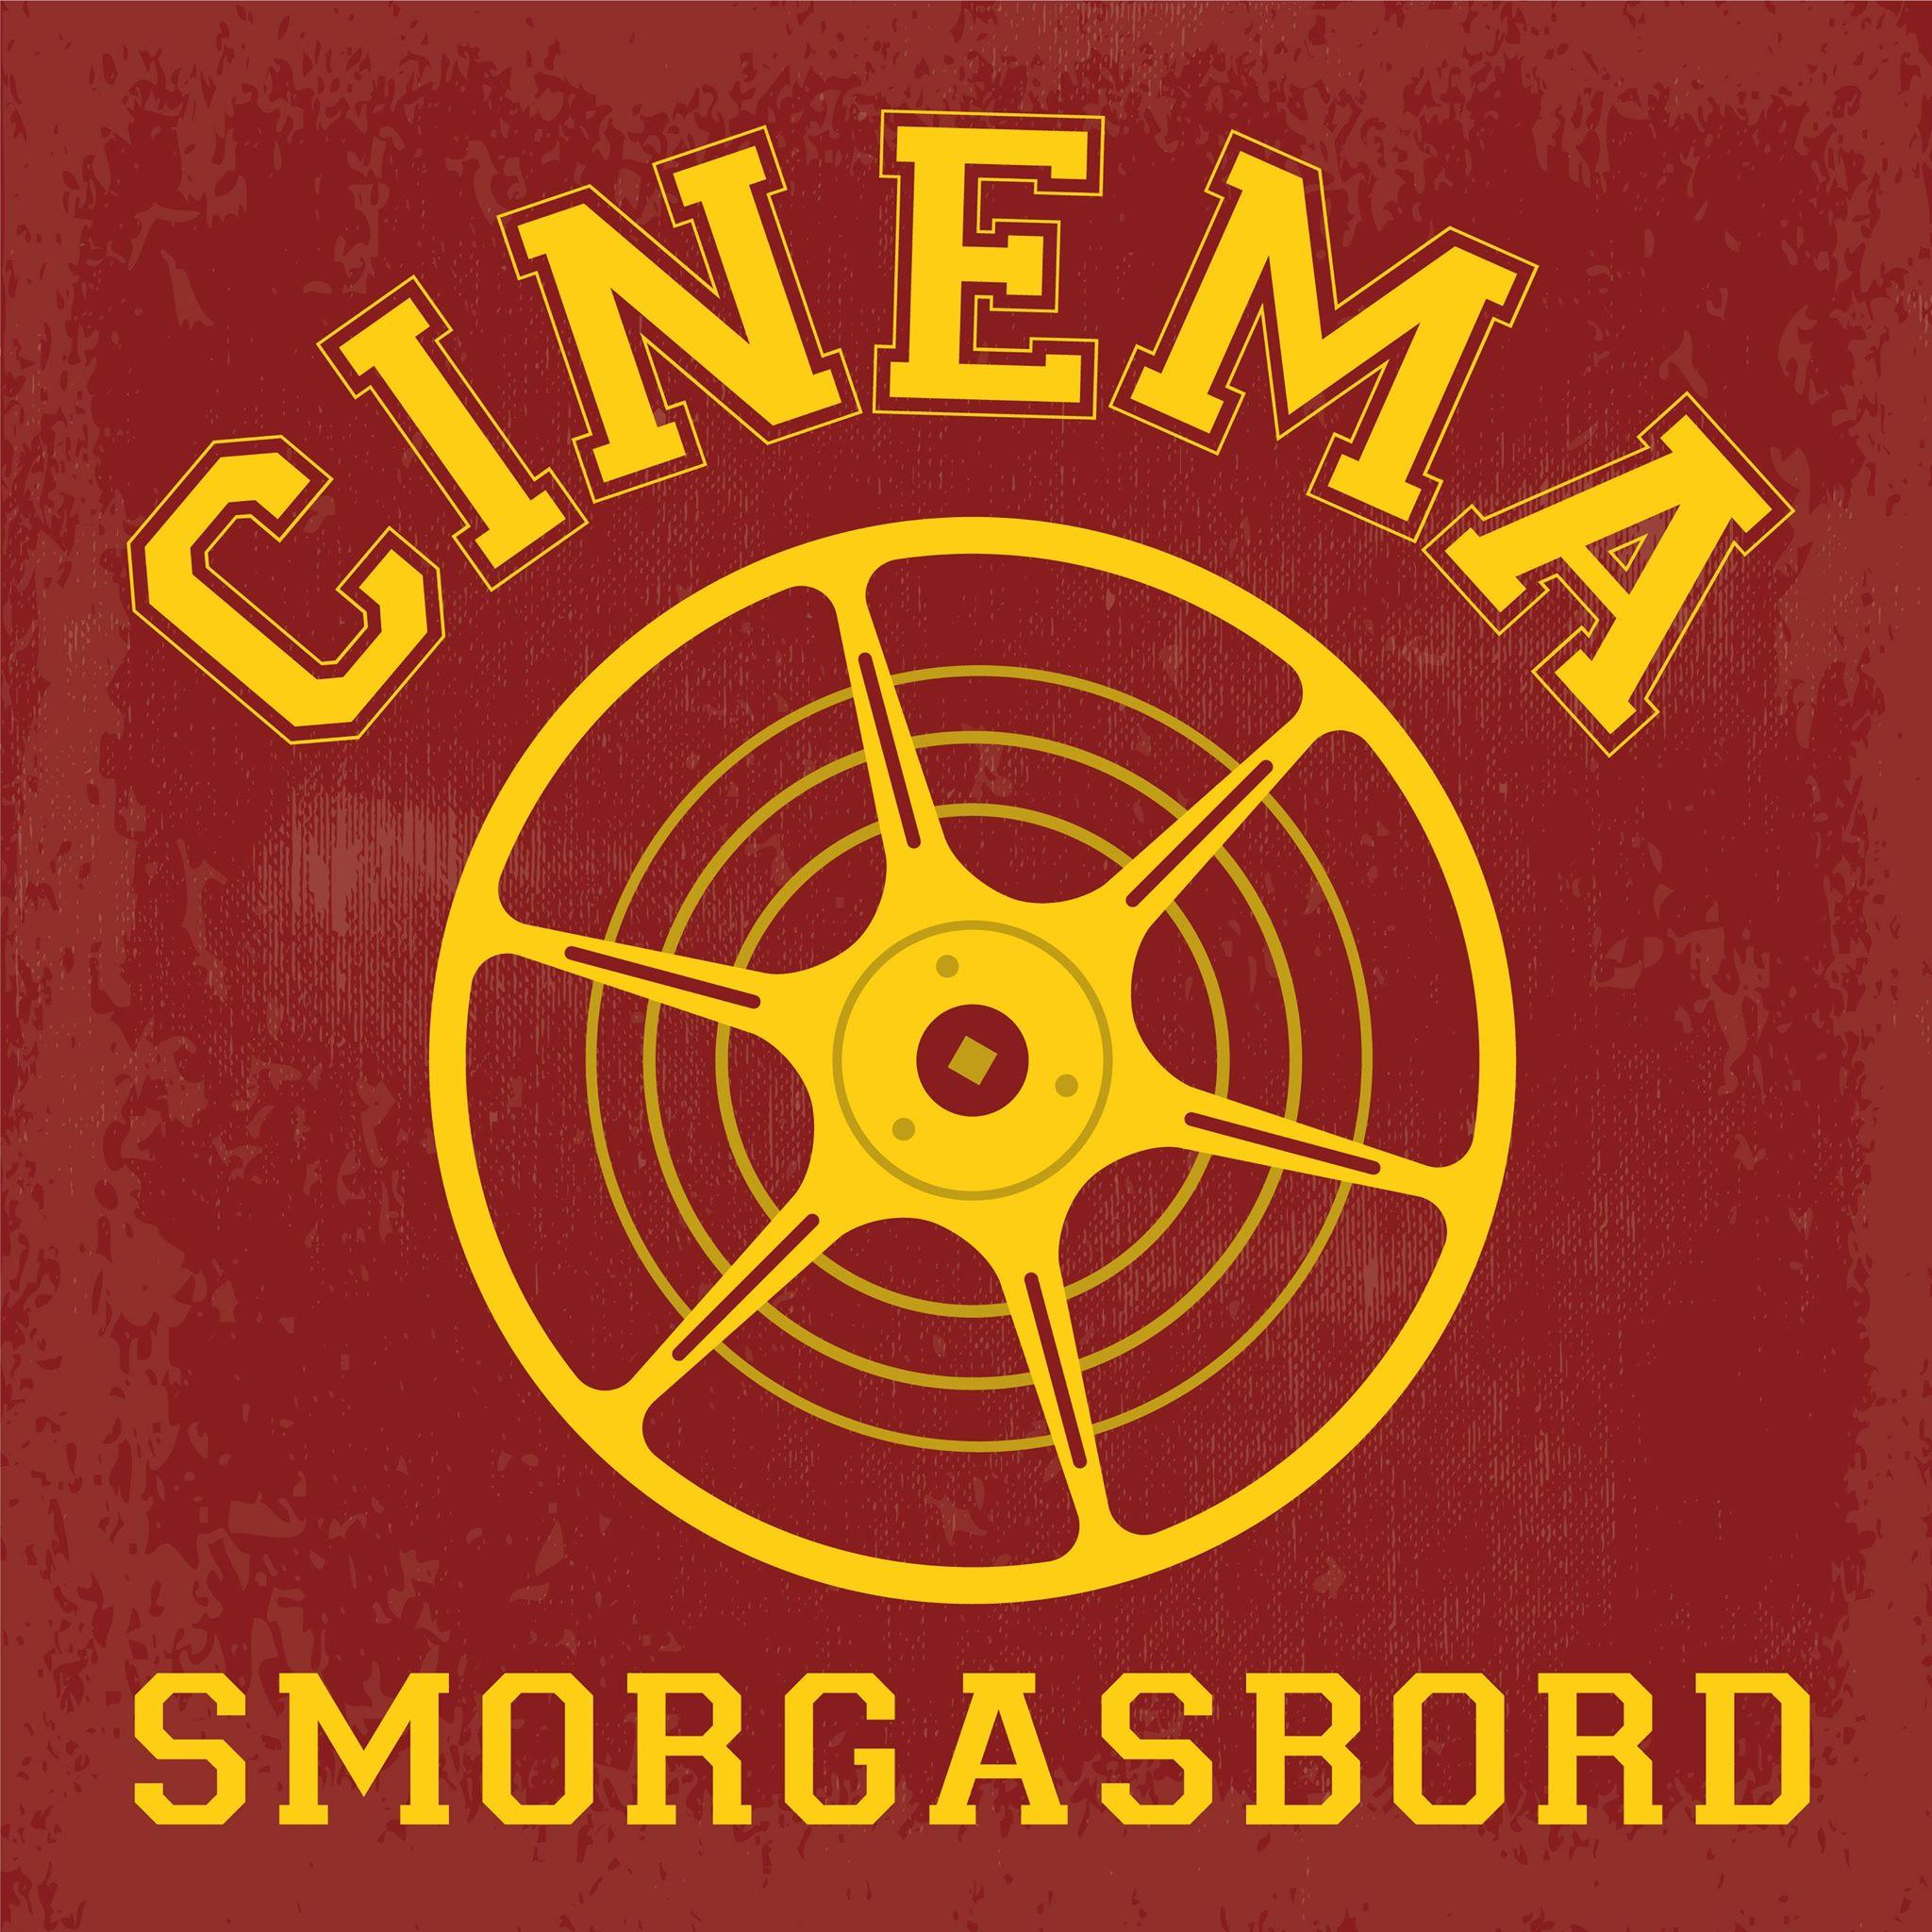 Cinema Smorgasbord